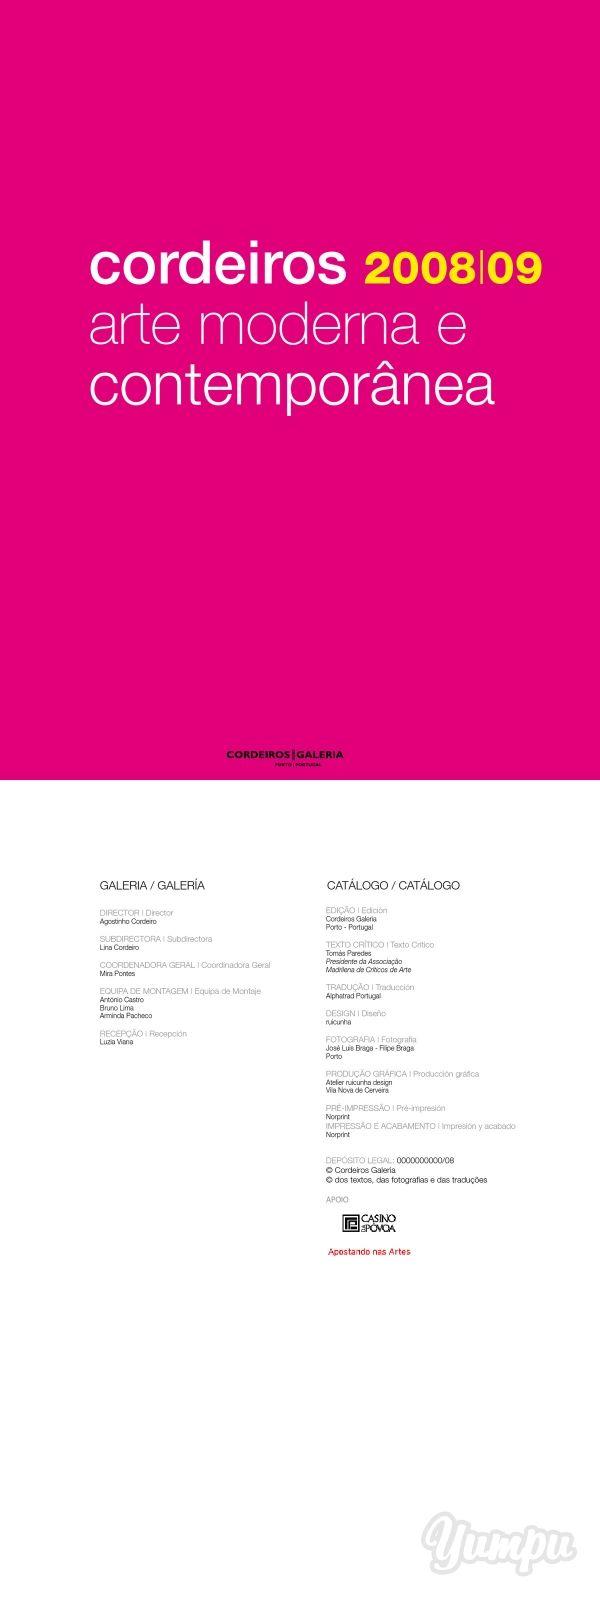 cordeiros 2008|09 arte moderna e contemporânea - Galeria Cordeiros - Magazine with 636 pages: cordeiros 2008|09 arte moderna e contemporânea - Galeria Cordeiros